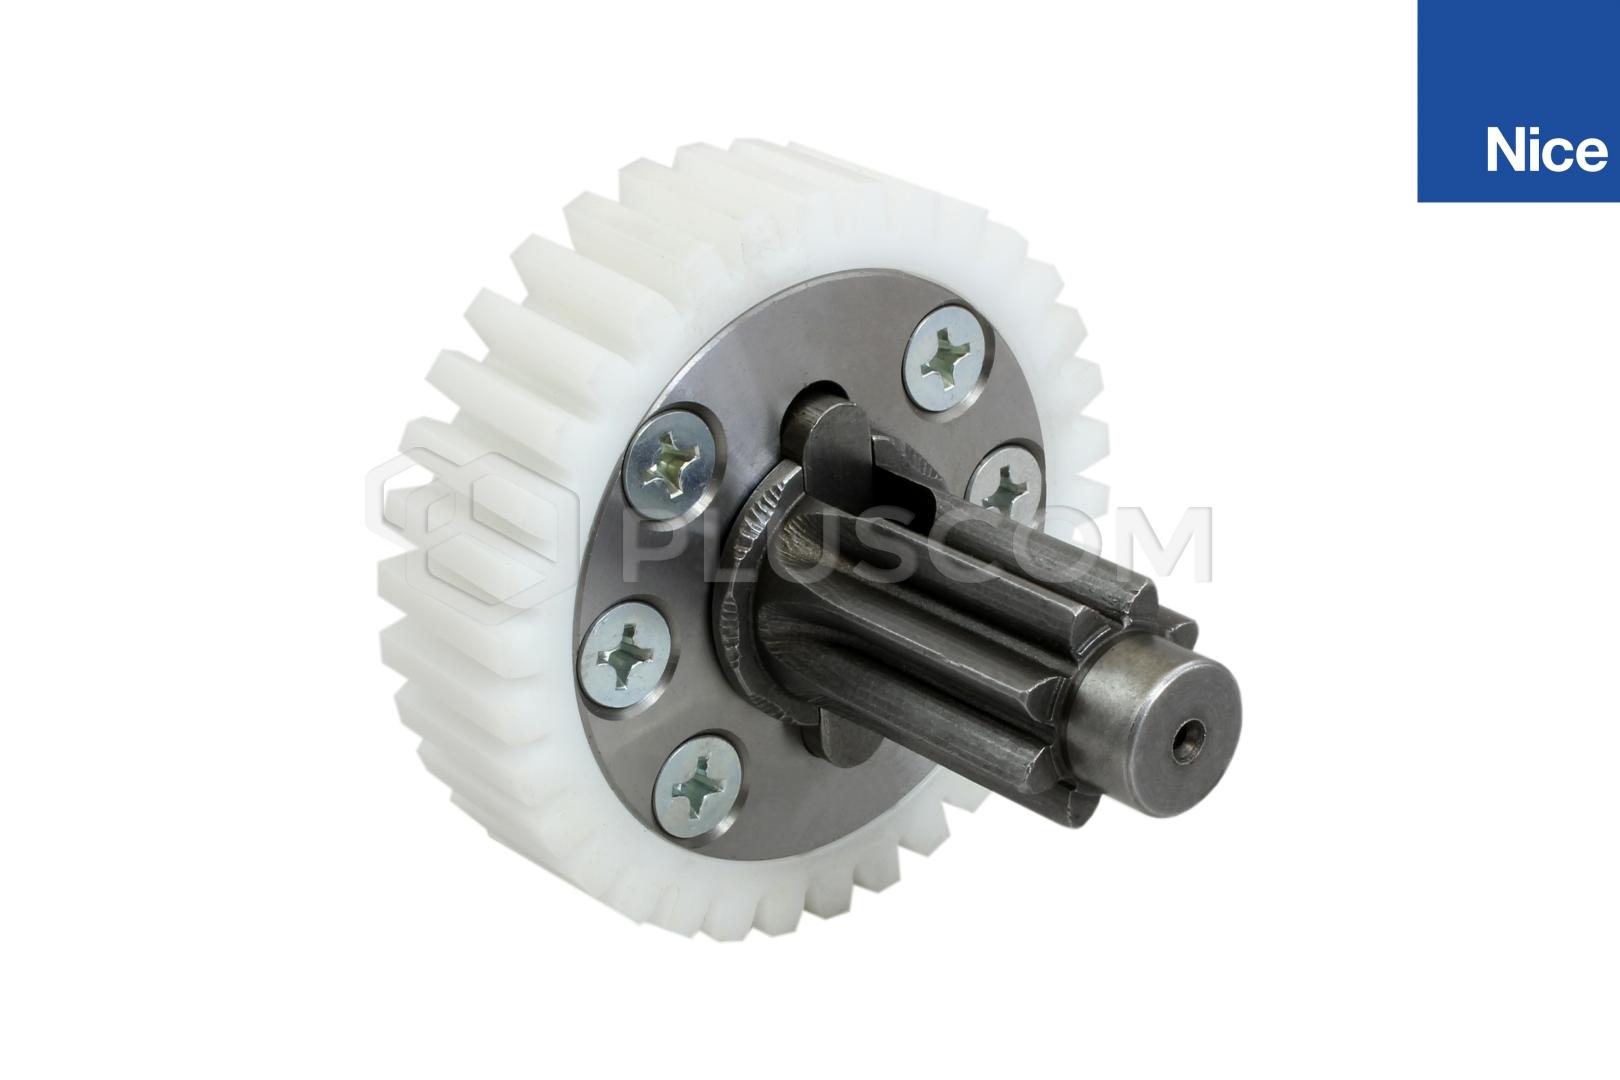 Nice PRSI05 Worm gear set SIGNO